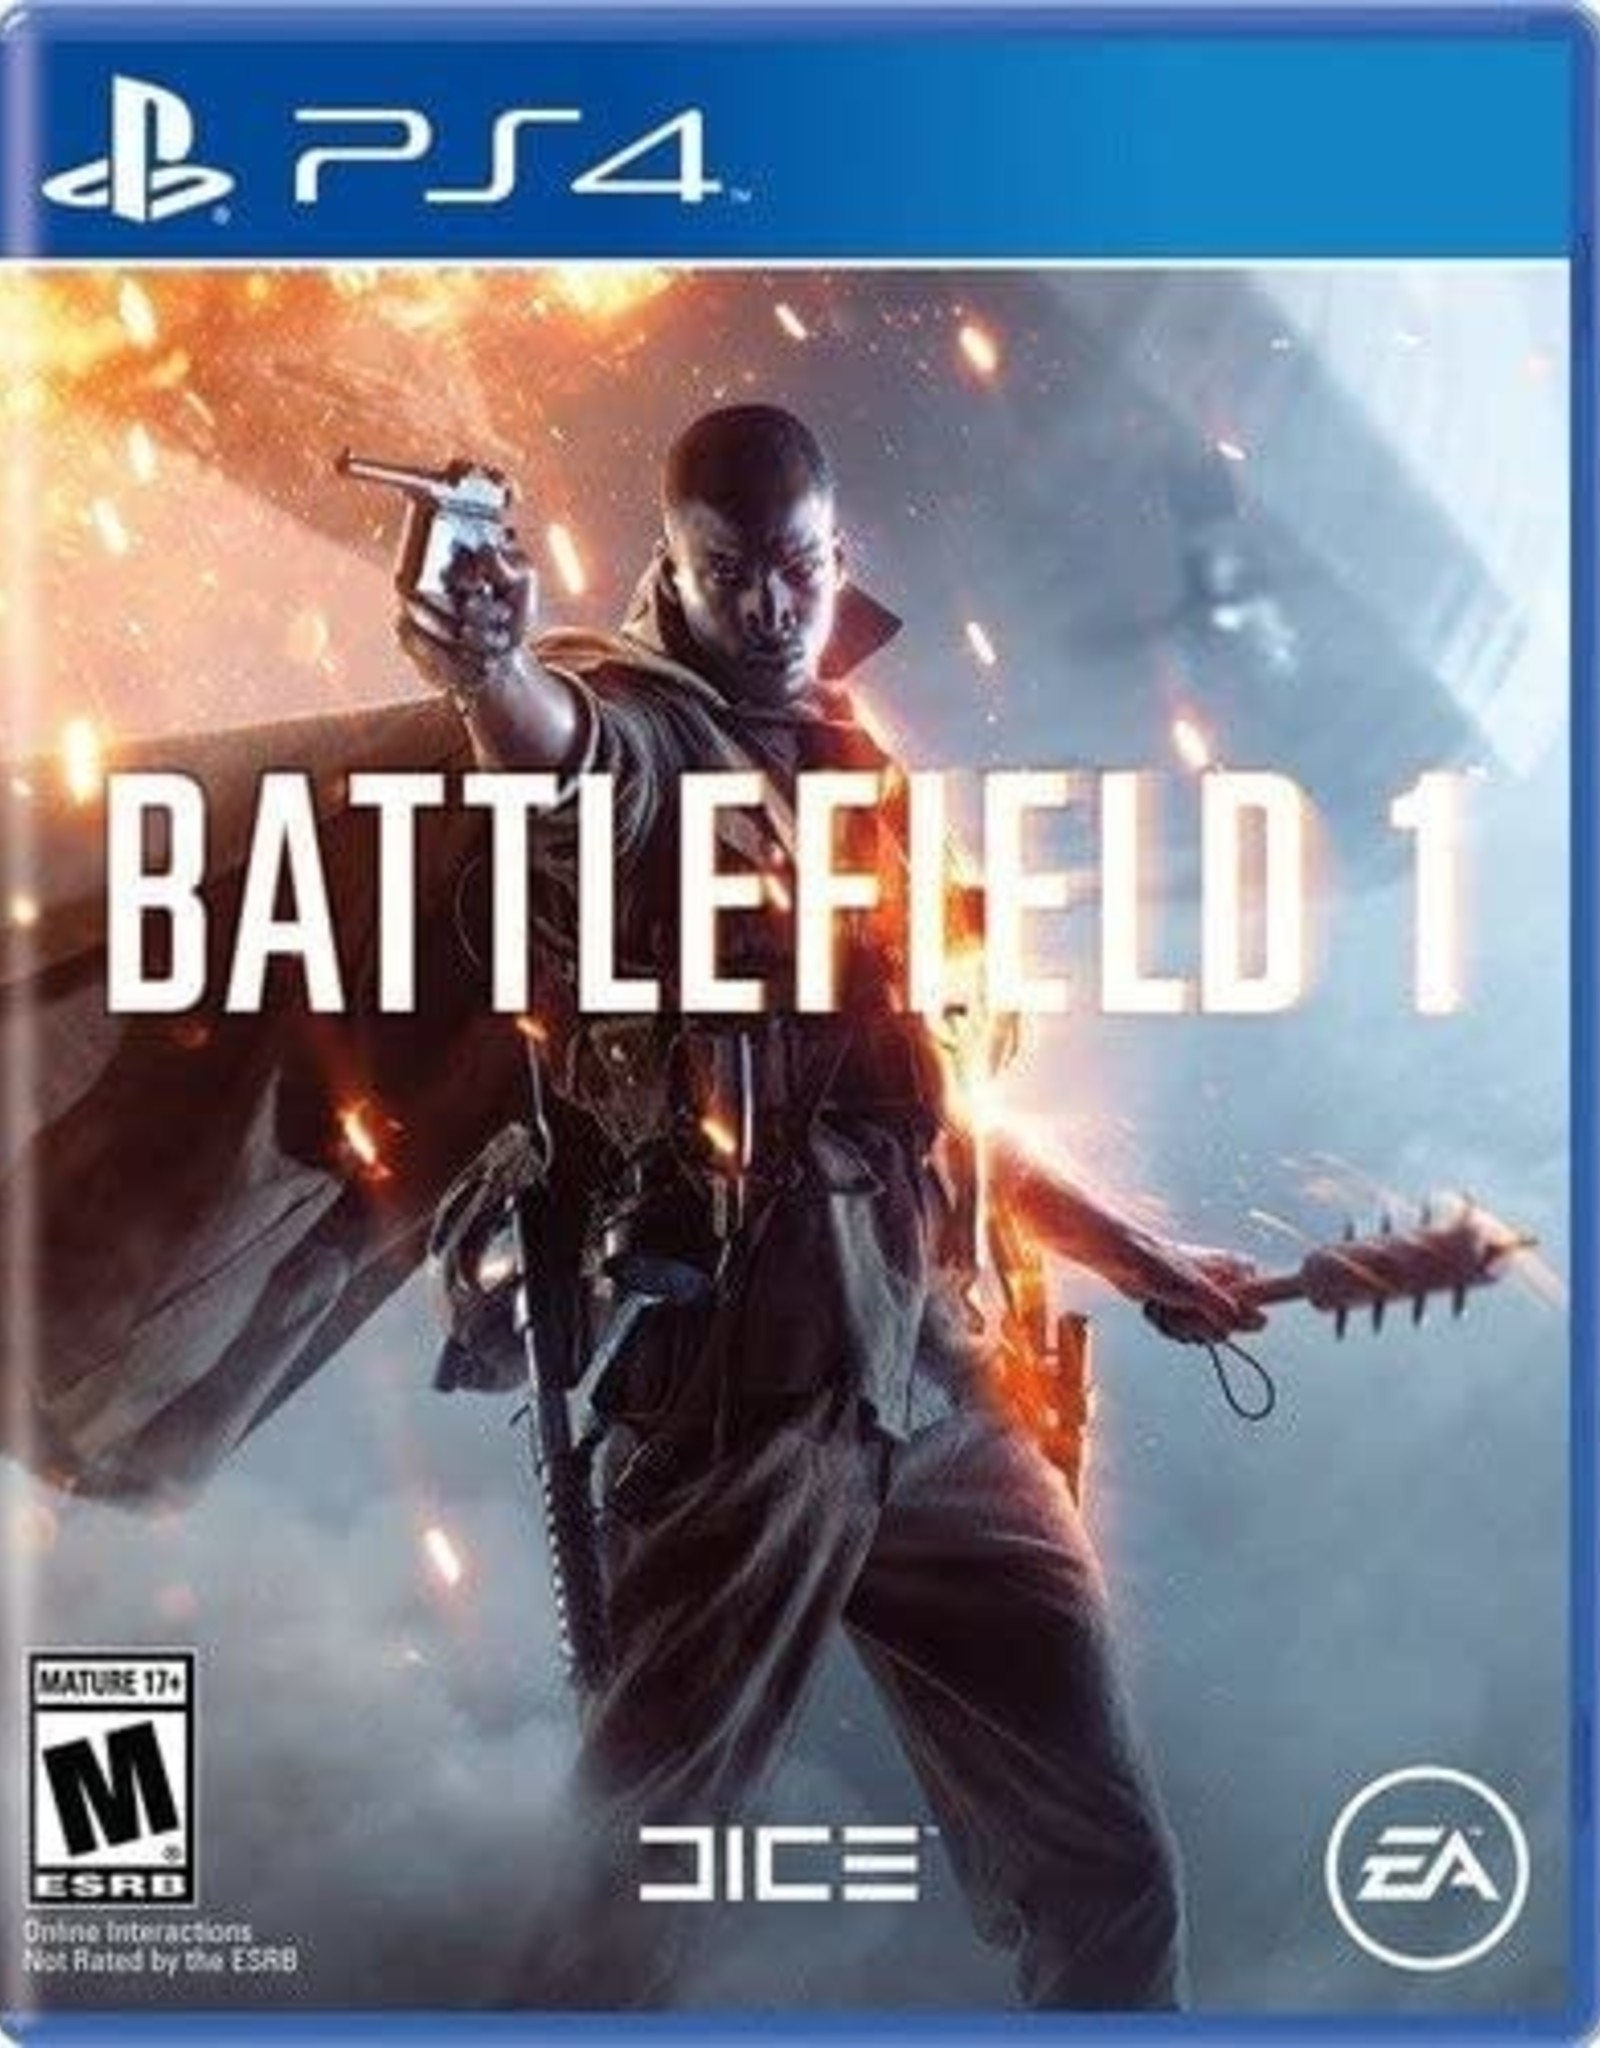 Playstation 4 Battlefield 1 (Used)